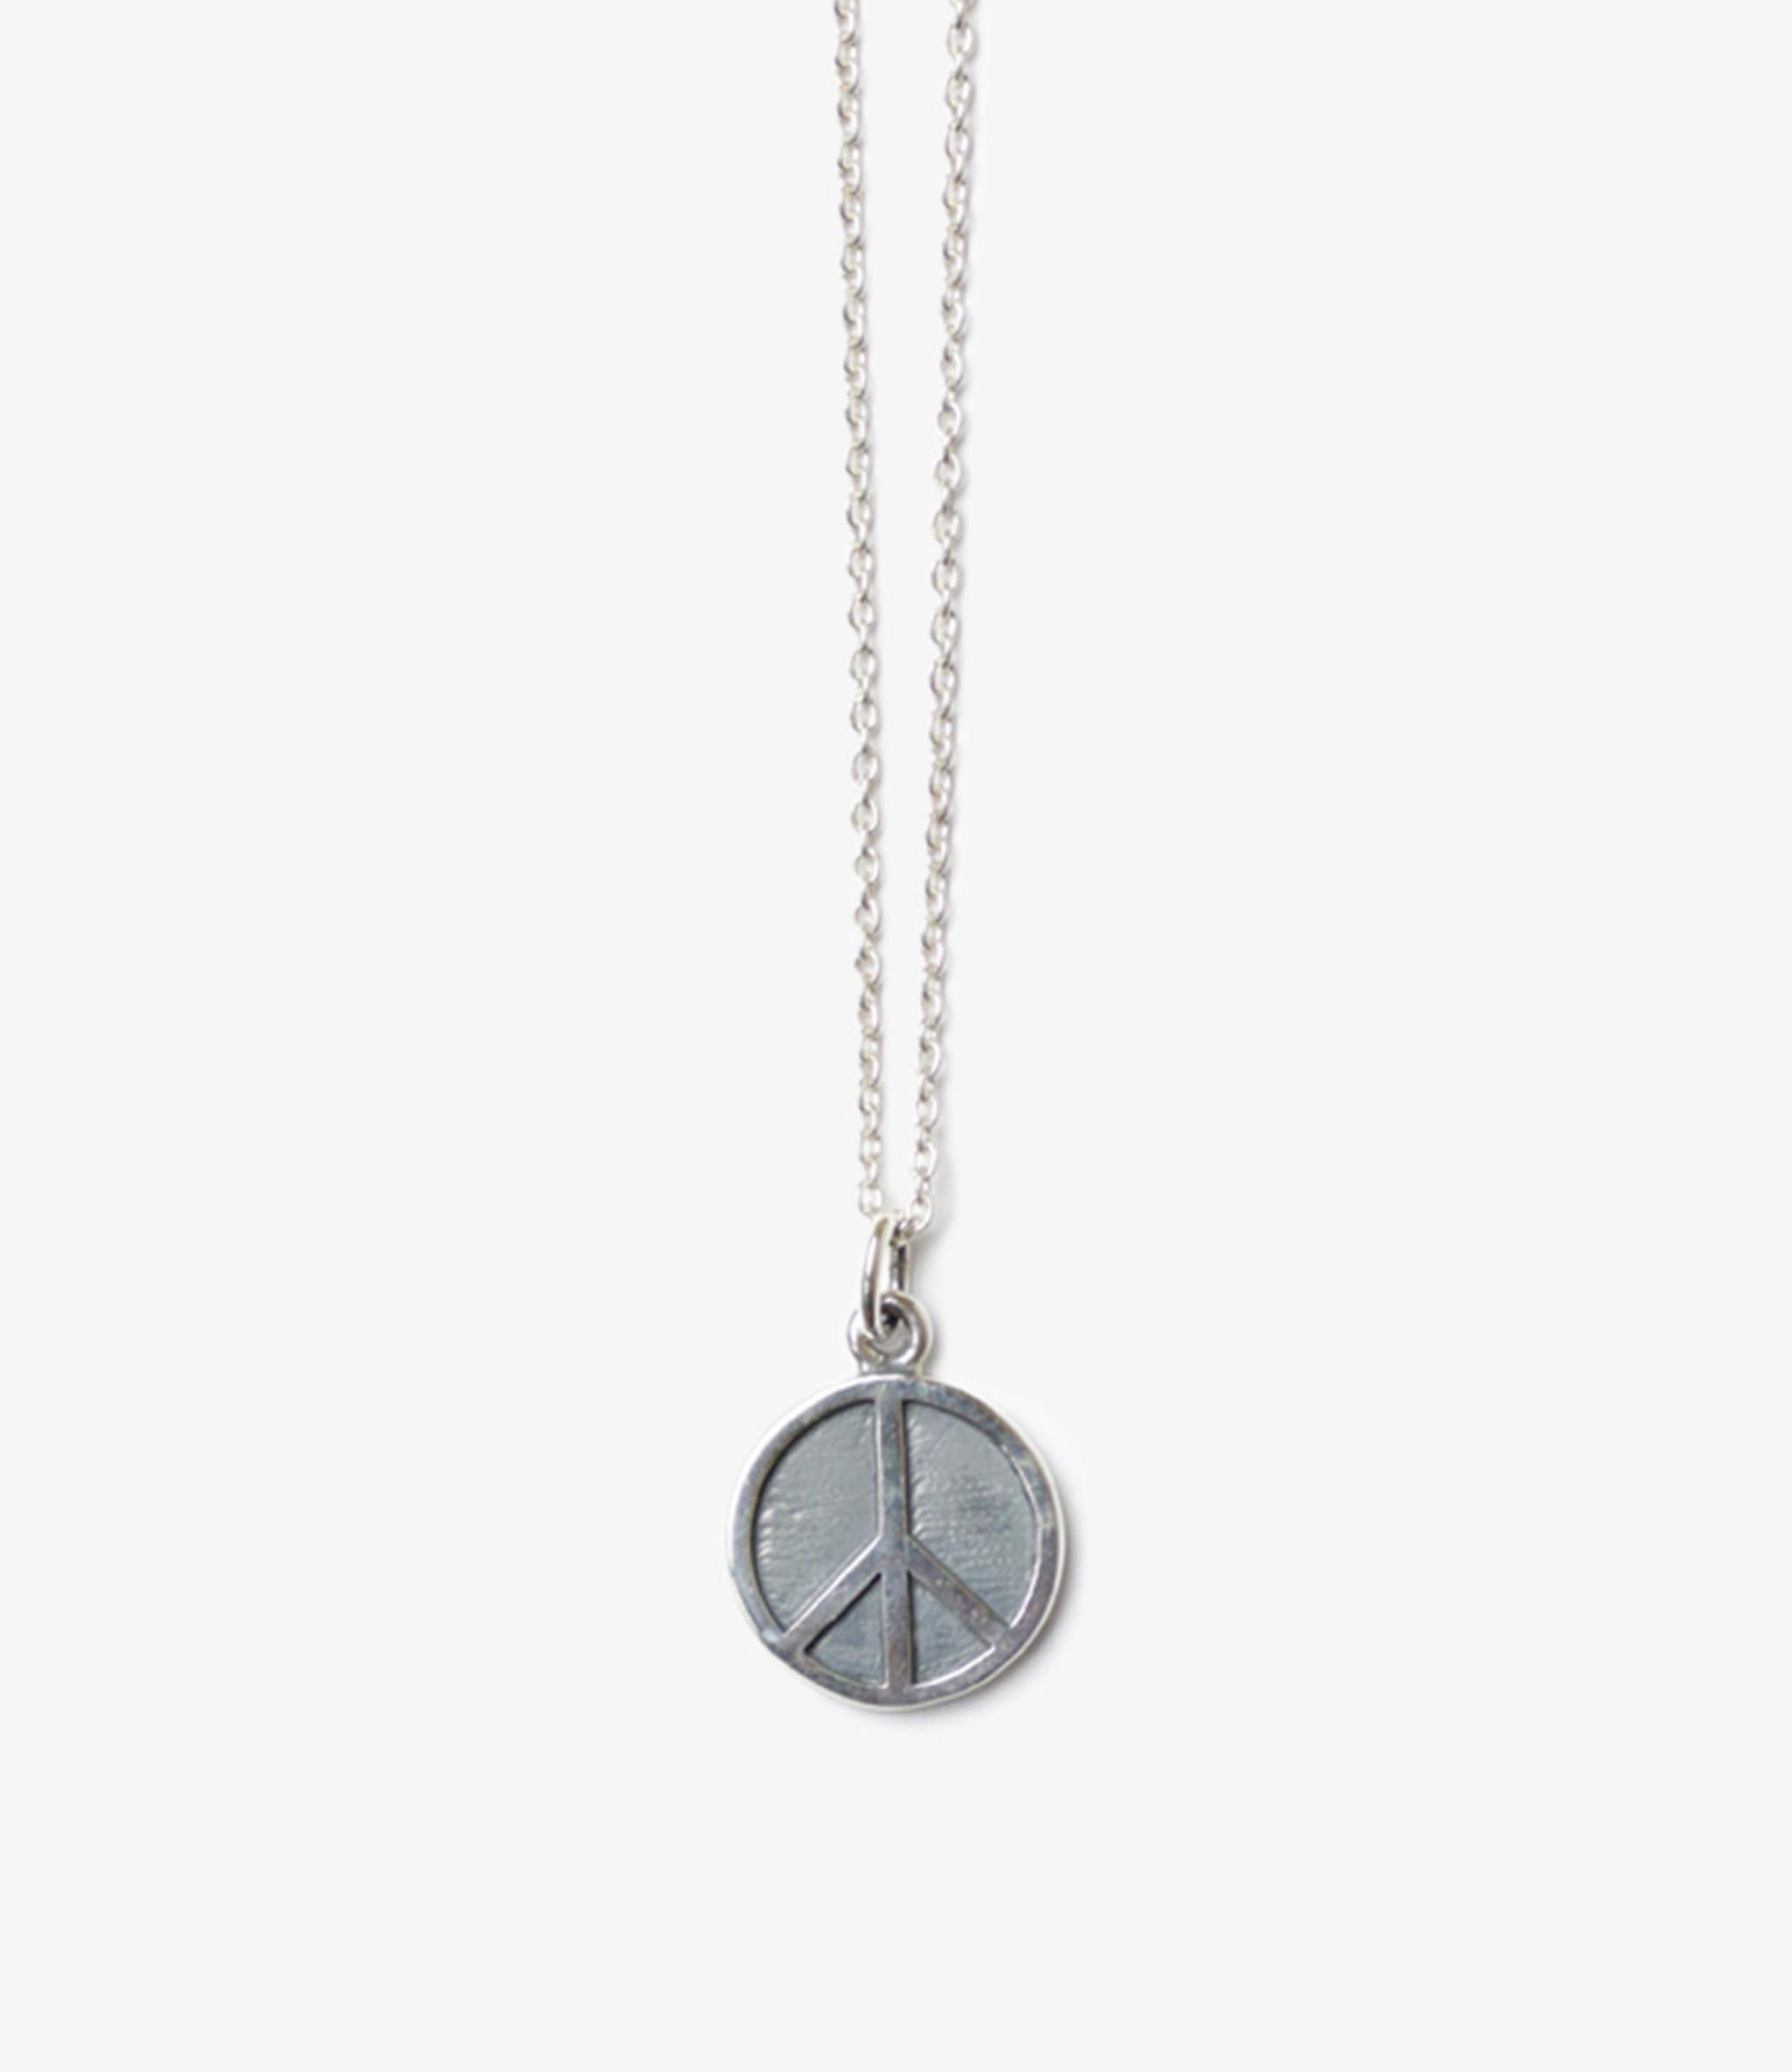 Needles Pendant - 925 Silver